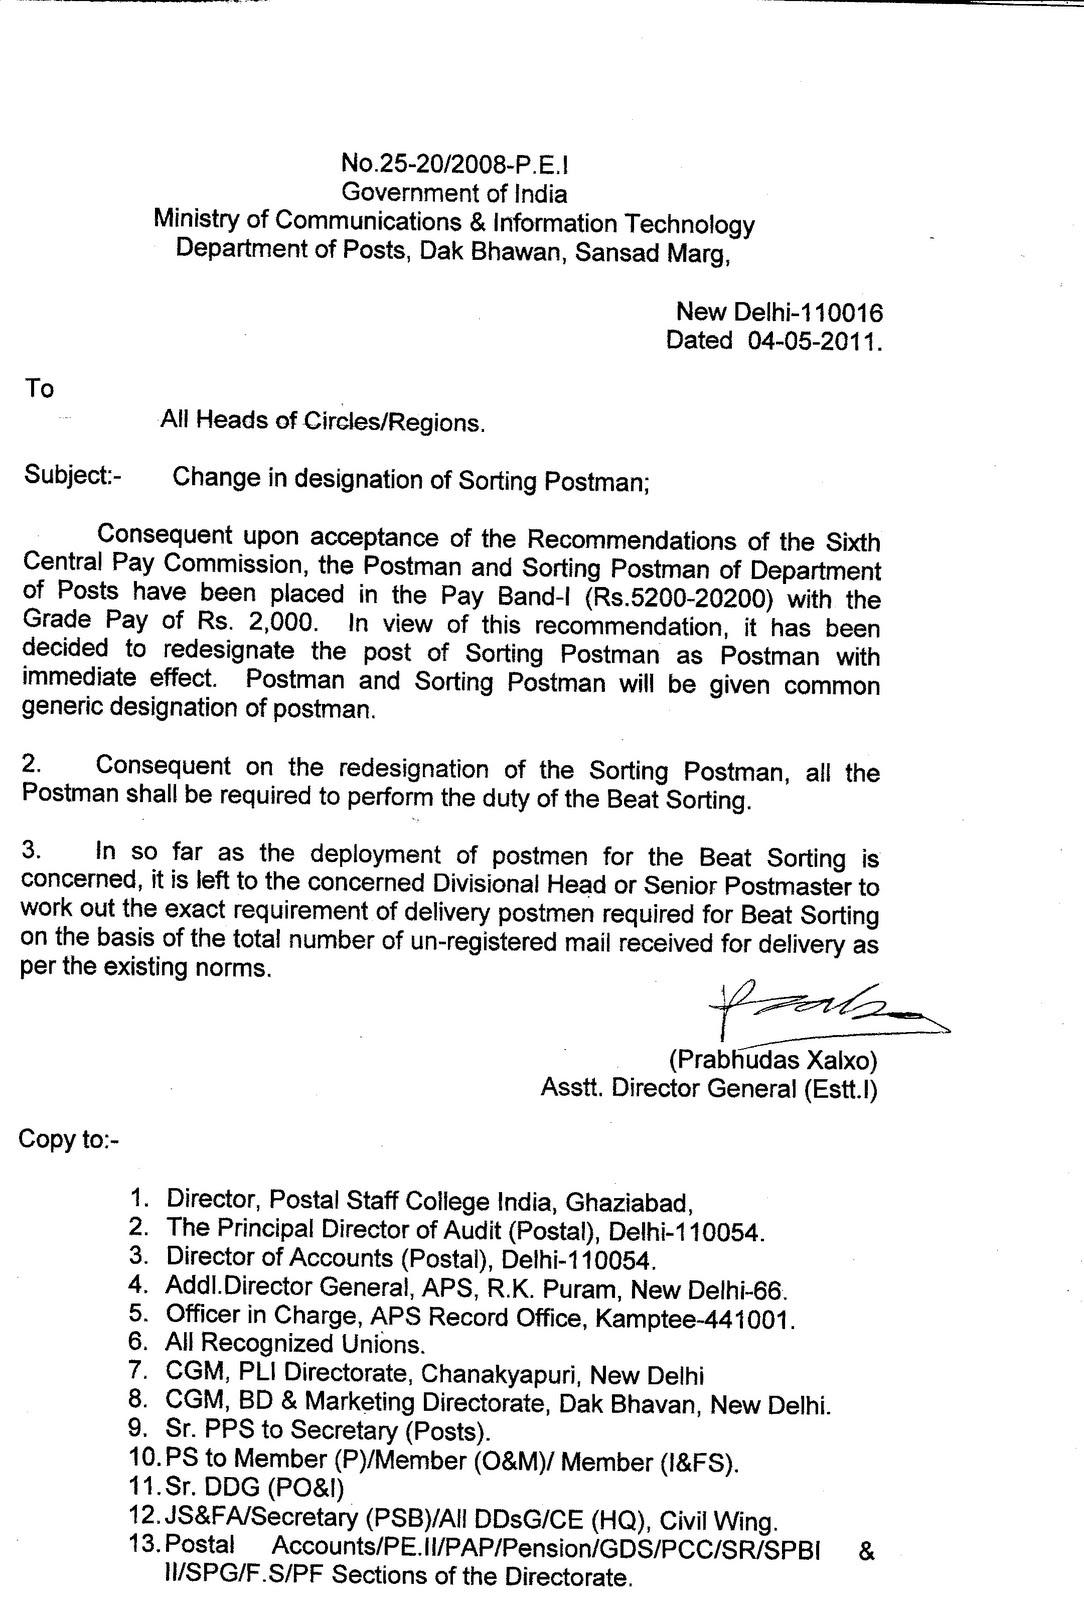 noc letter format property copy noc letter format for government ...